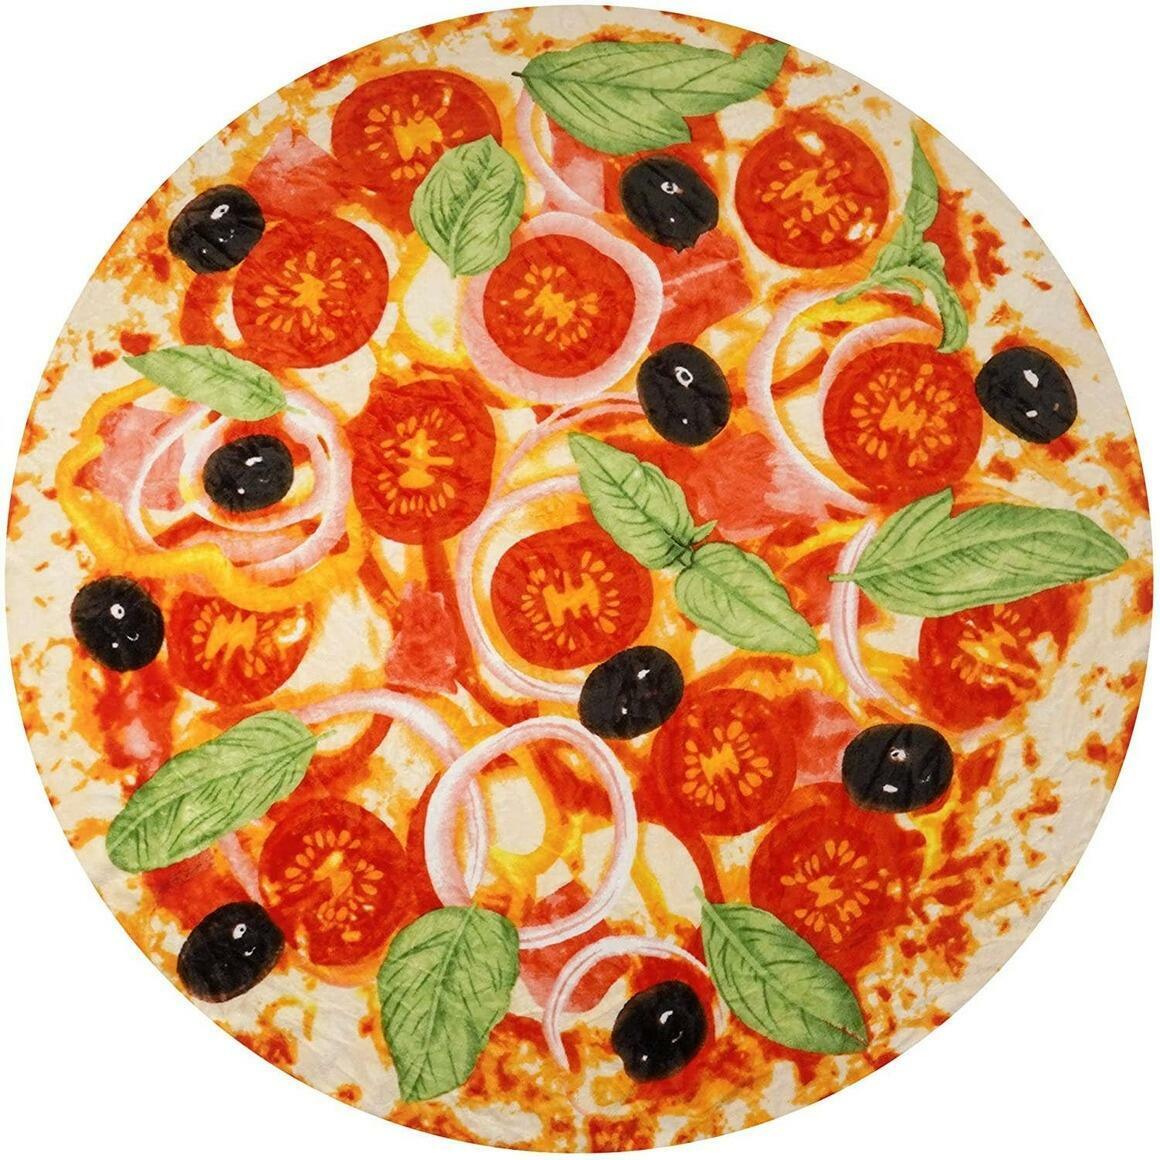 Giant Pizza Blanket - Novelty Big Pizza Blanket (60 Inch) | Trada Marketplace